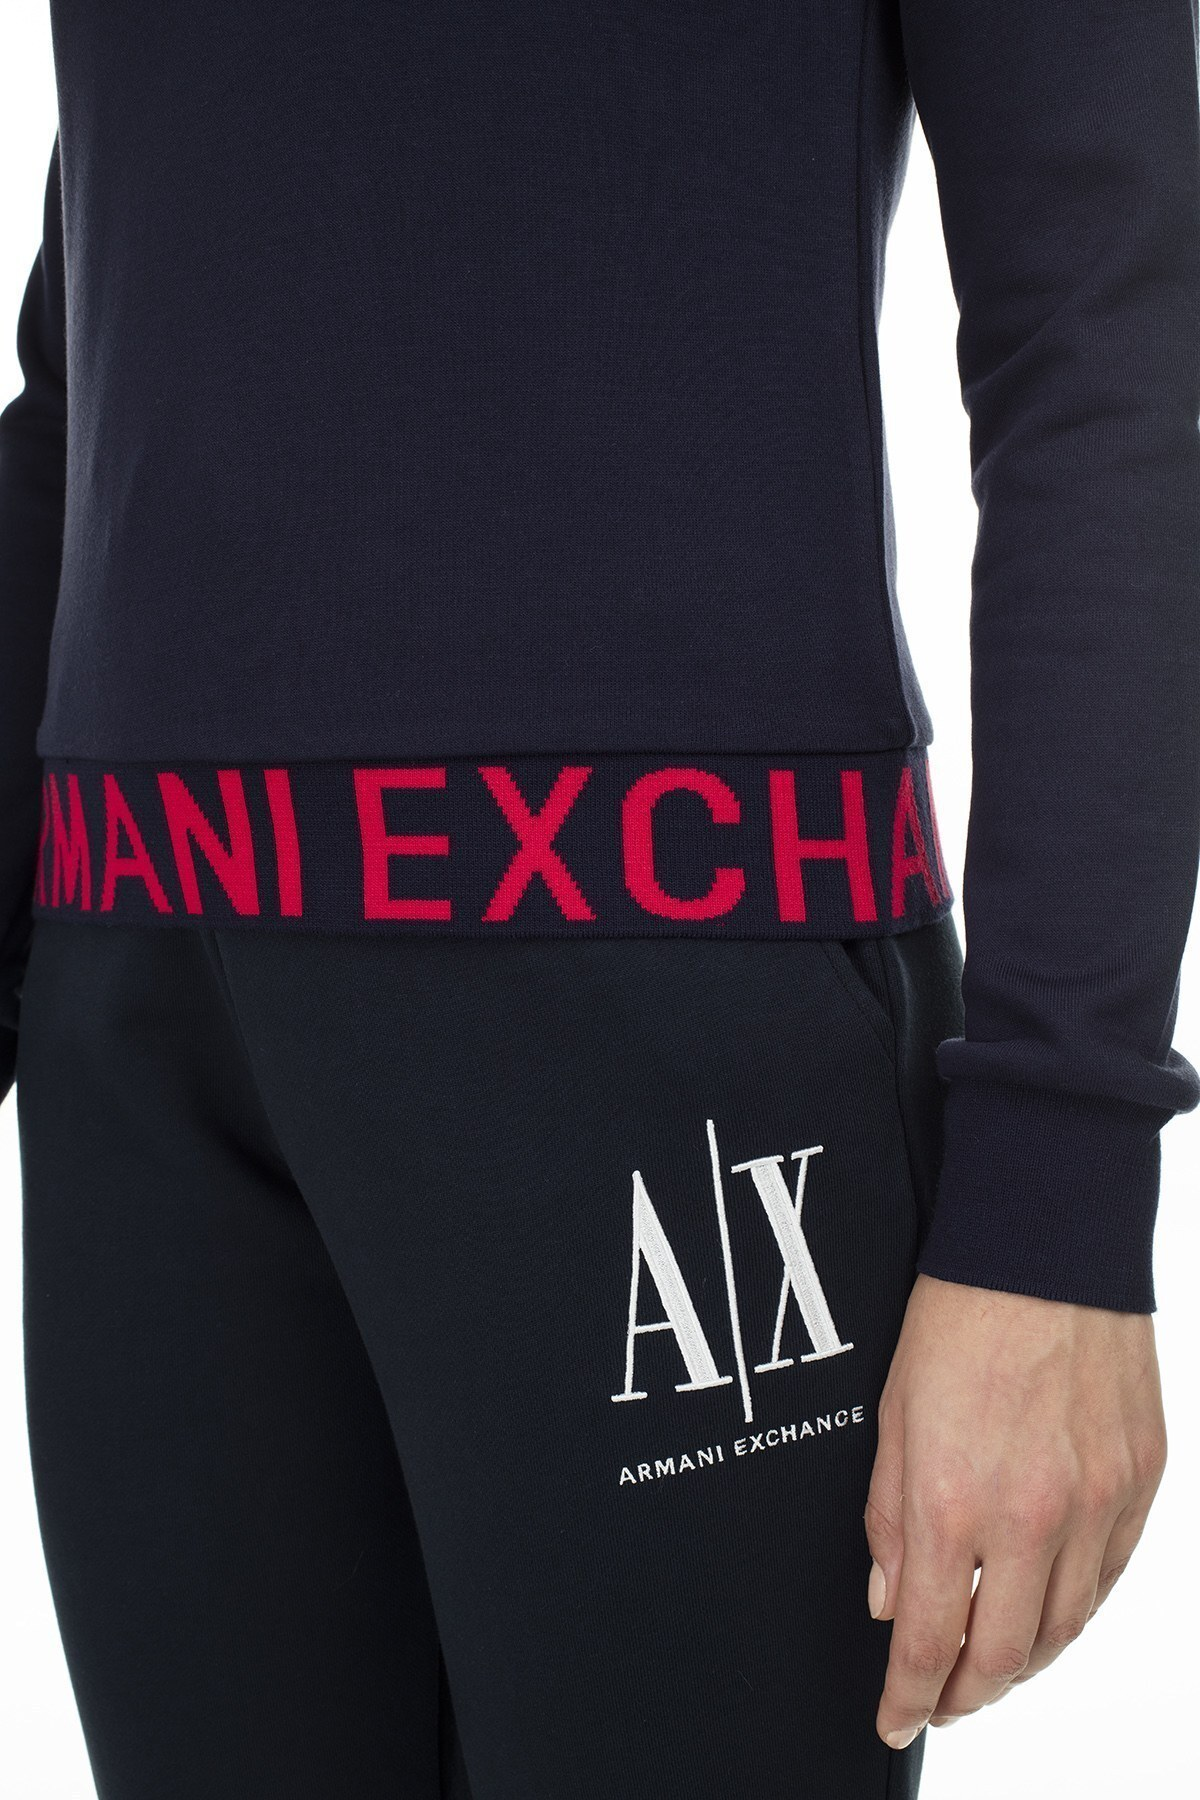 Armani Exchange Logo Baskılı Bisiklet Yaka Bayan Sweat S 6GYM05 YJE5Z 1593 LACİVERT